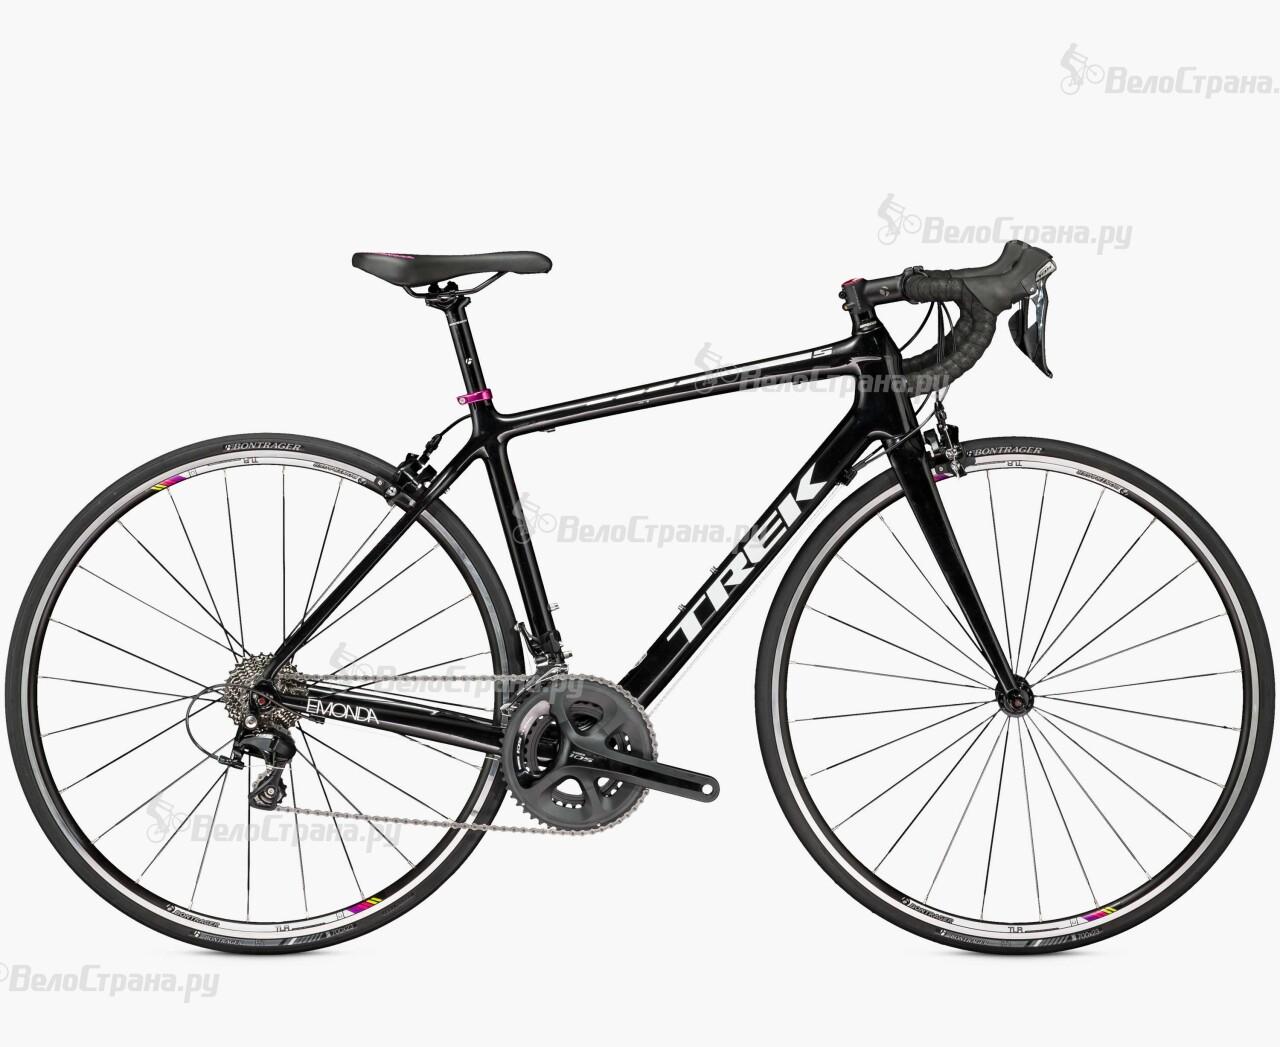 Велосипед Trek Émonda S 5 WSD (2016) велосипед trek madone 9 5 c wsd udi2 2017